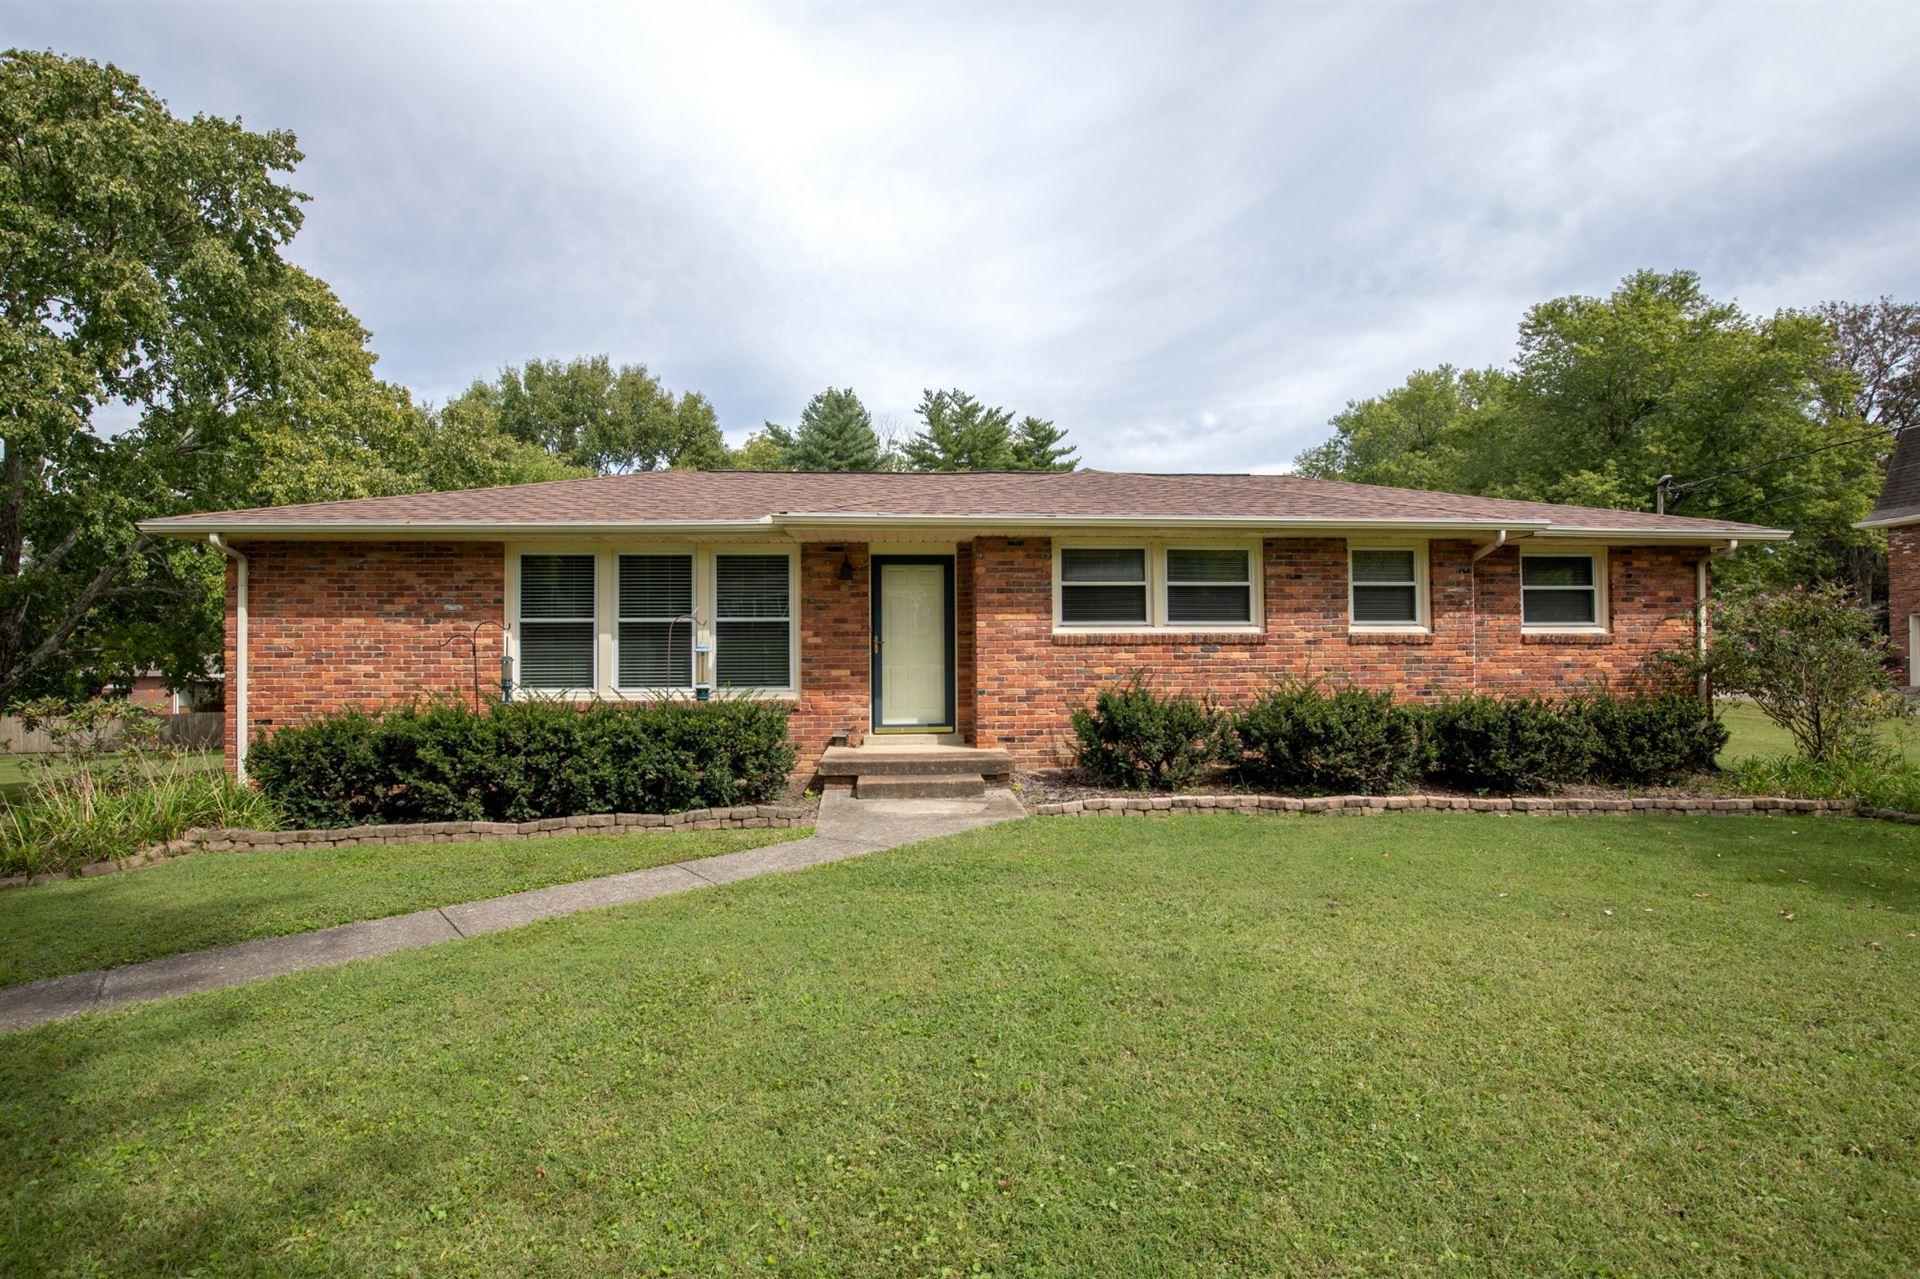 129 Cherokee Rd, Hendersonville, TN 37075 - MLS#: 2191765